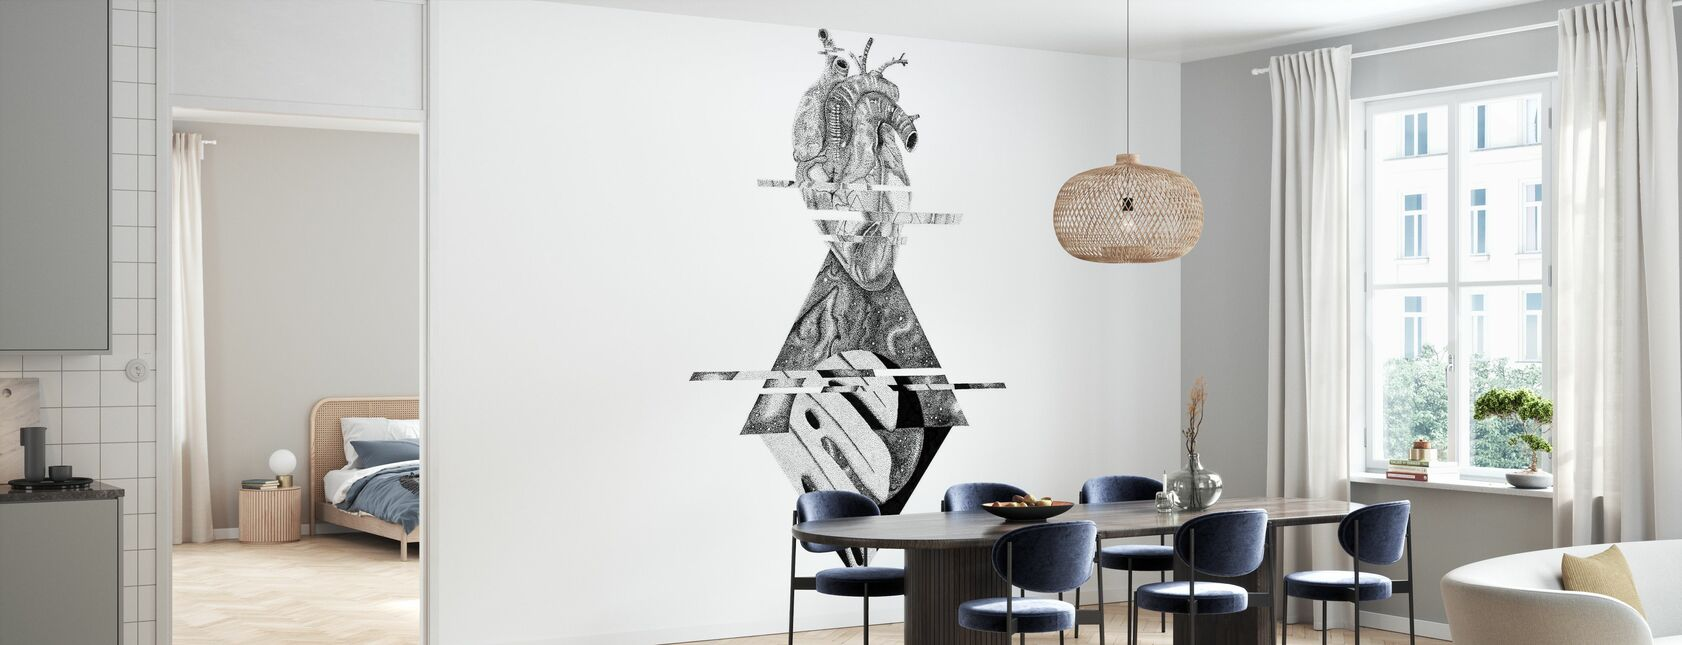 Interrupted Universe III - Wallpaper - Kitchen